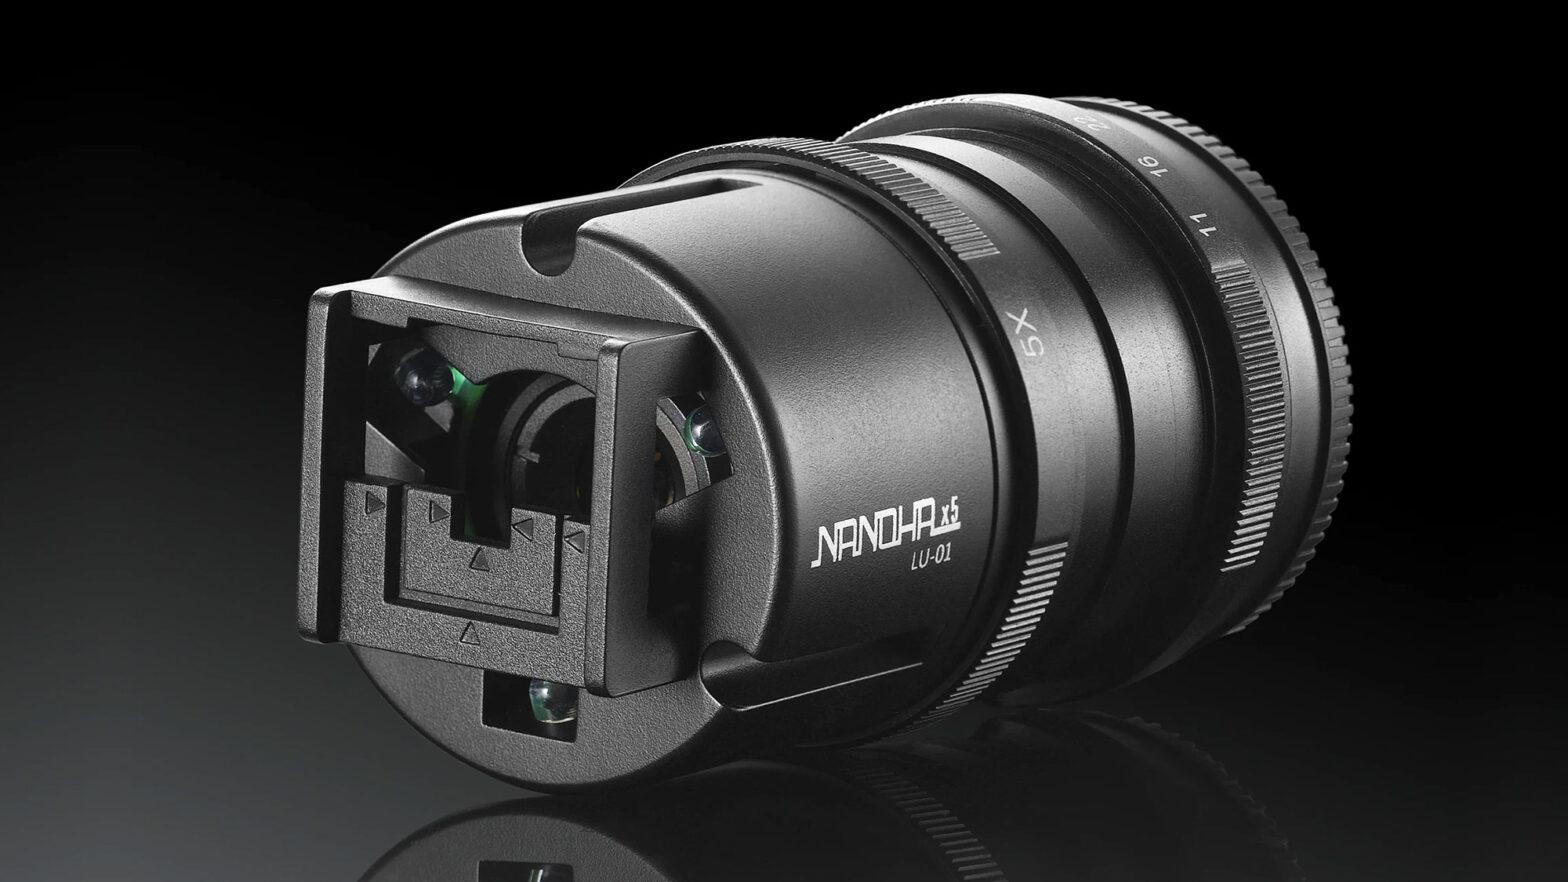 Yasuhara Nanoha Macro Lens for Mirrorless Cameras